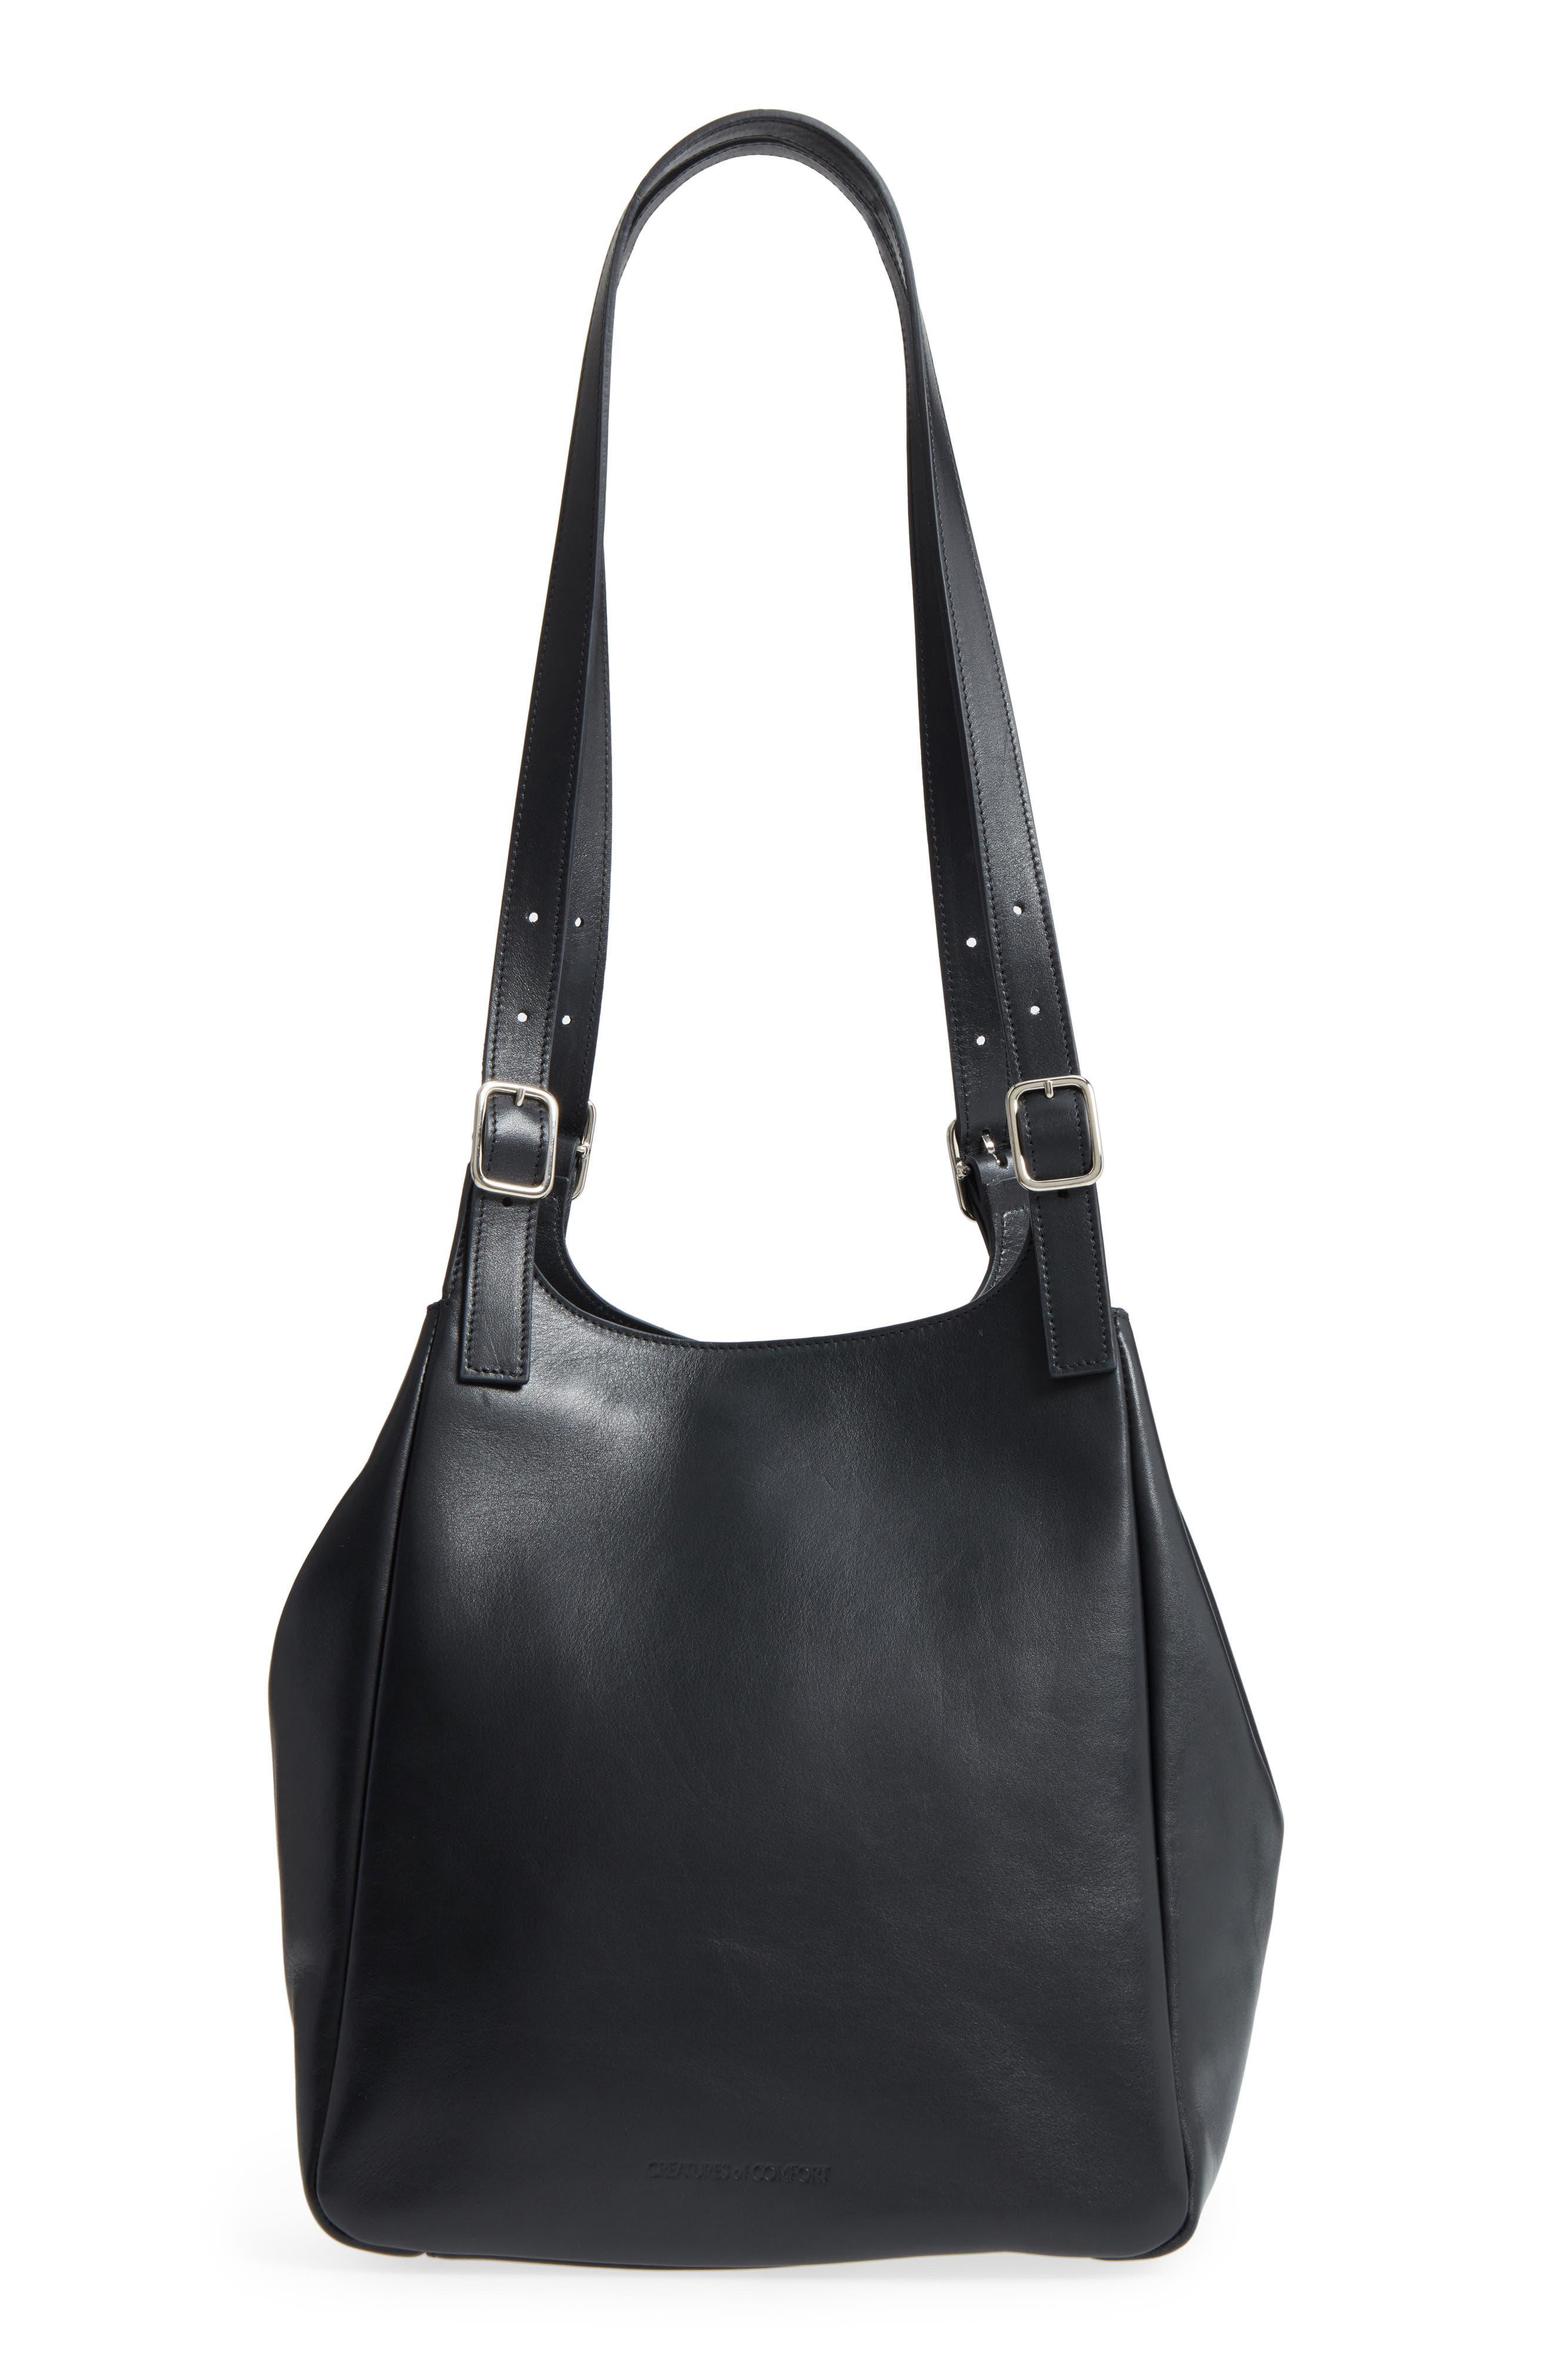 Main Image - Creatures of Comfort Pint Bag